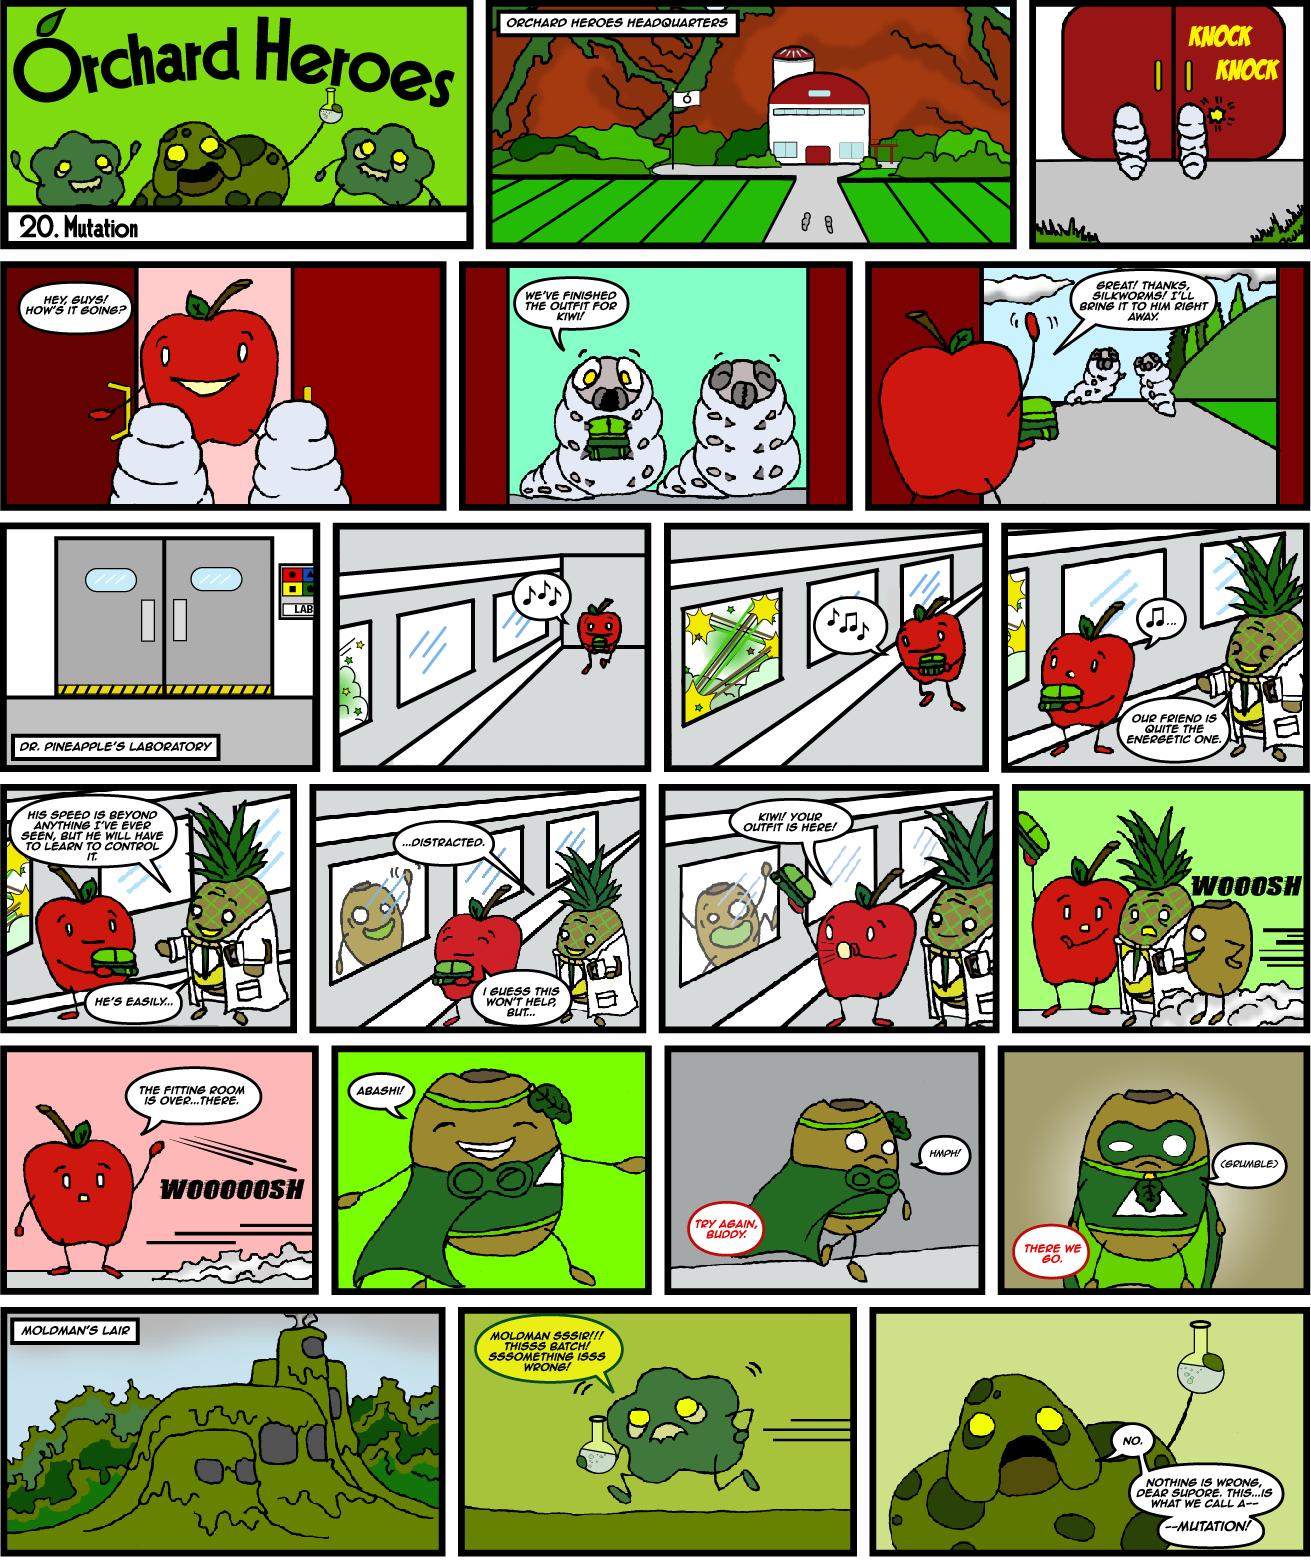 Issue 20: Mutation